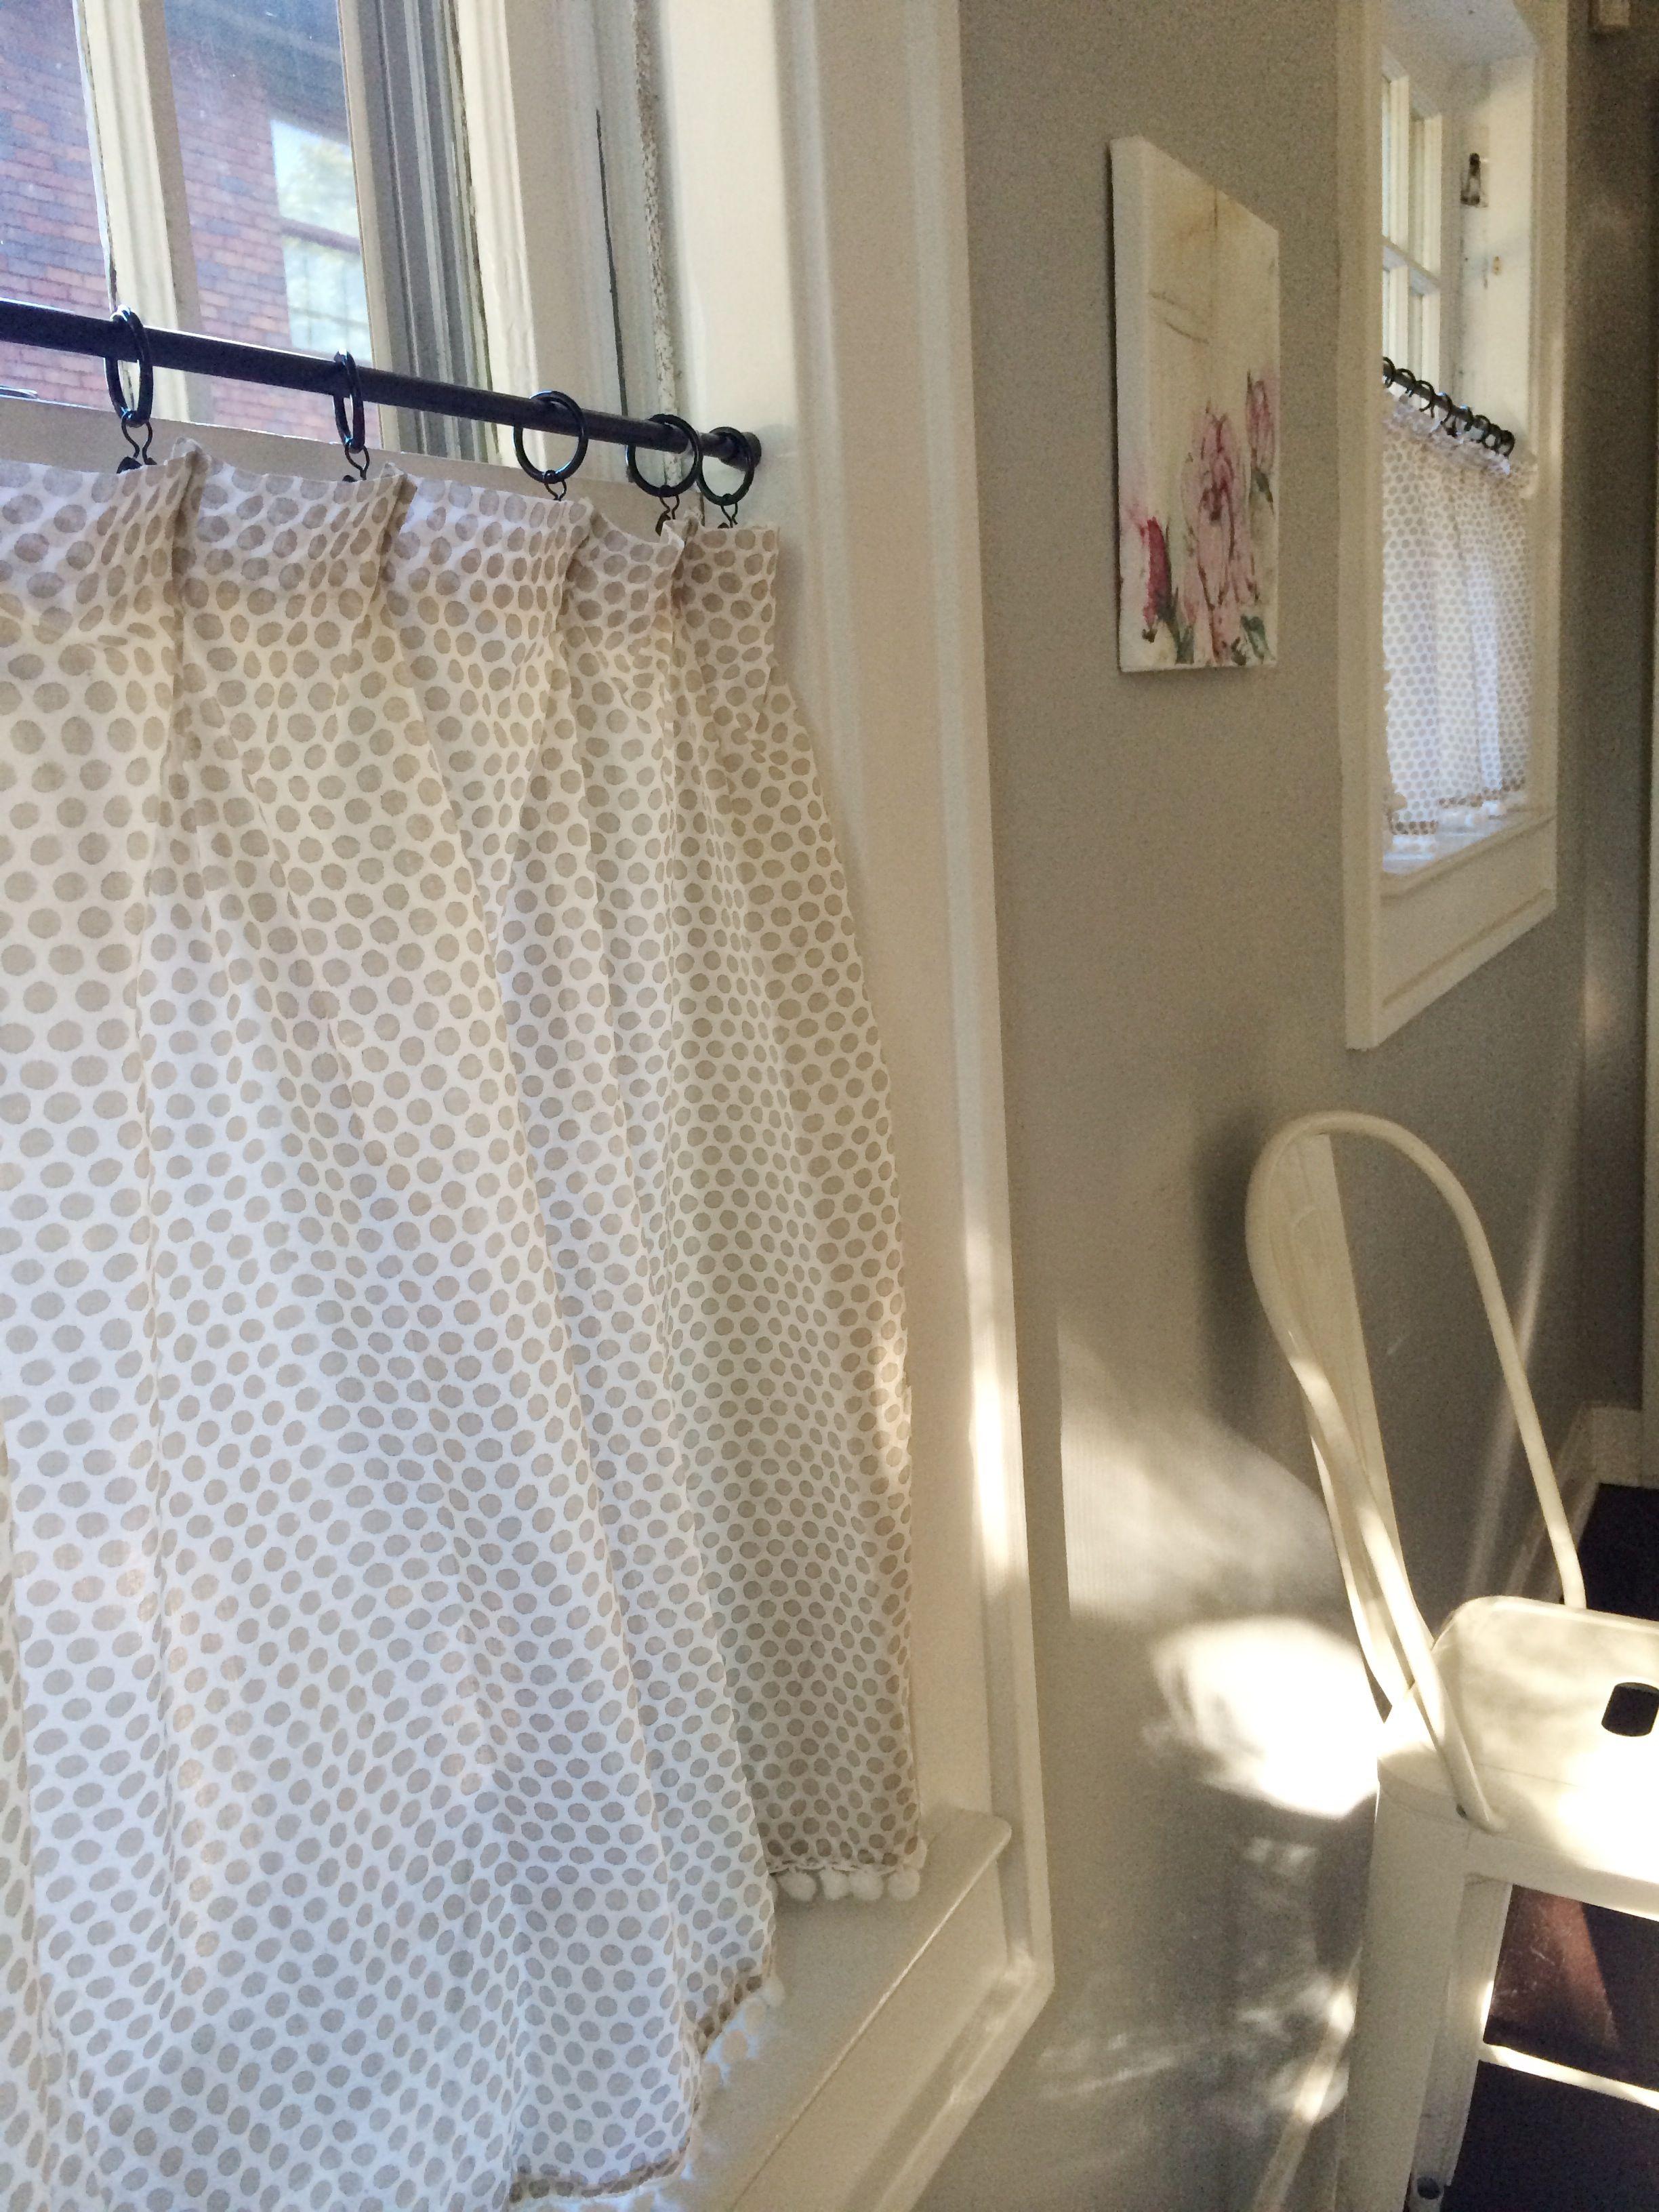 DIY Cafe Curtains. Love the gray polka dot and Pom Pom fringe.